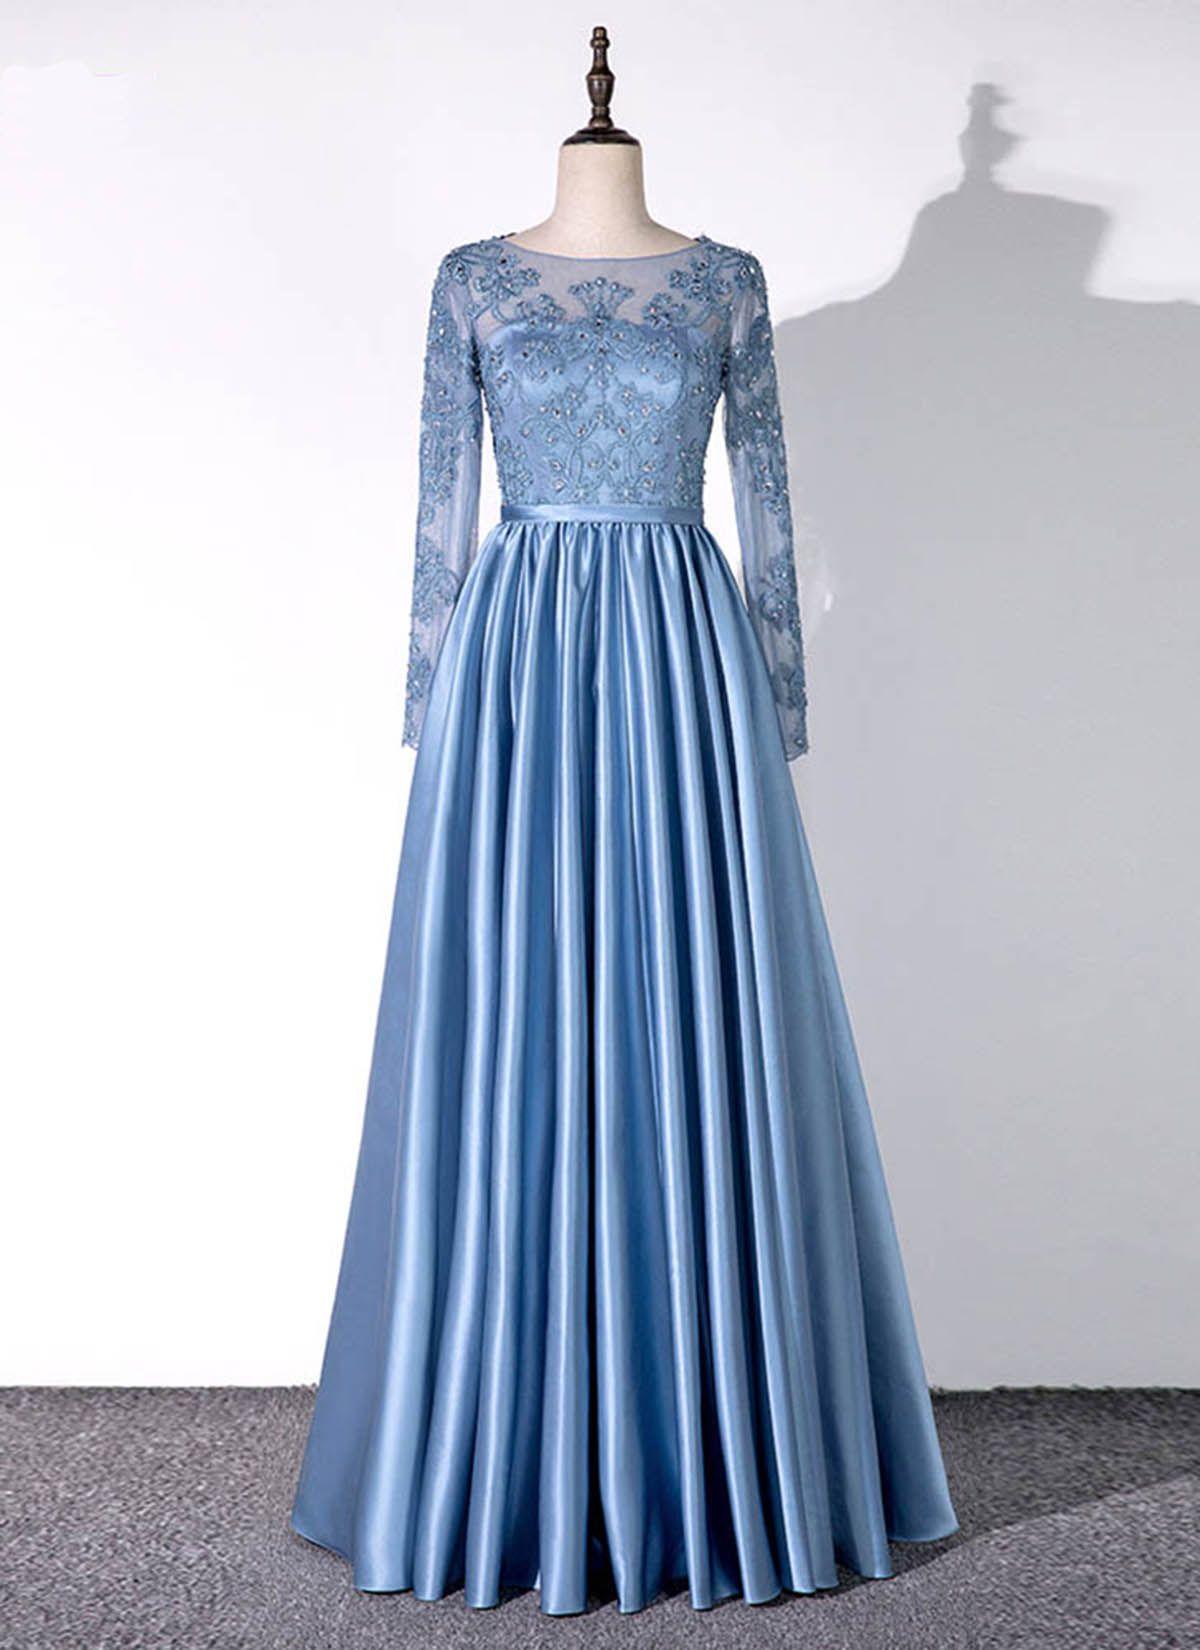 Blue satin long sleeve aline handmade plus size prom